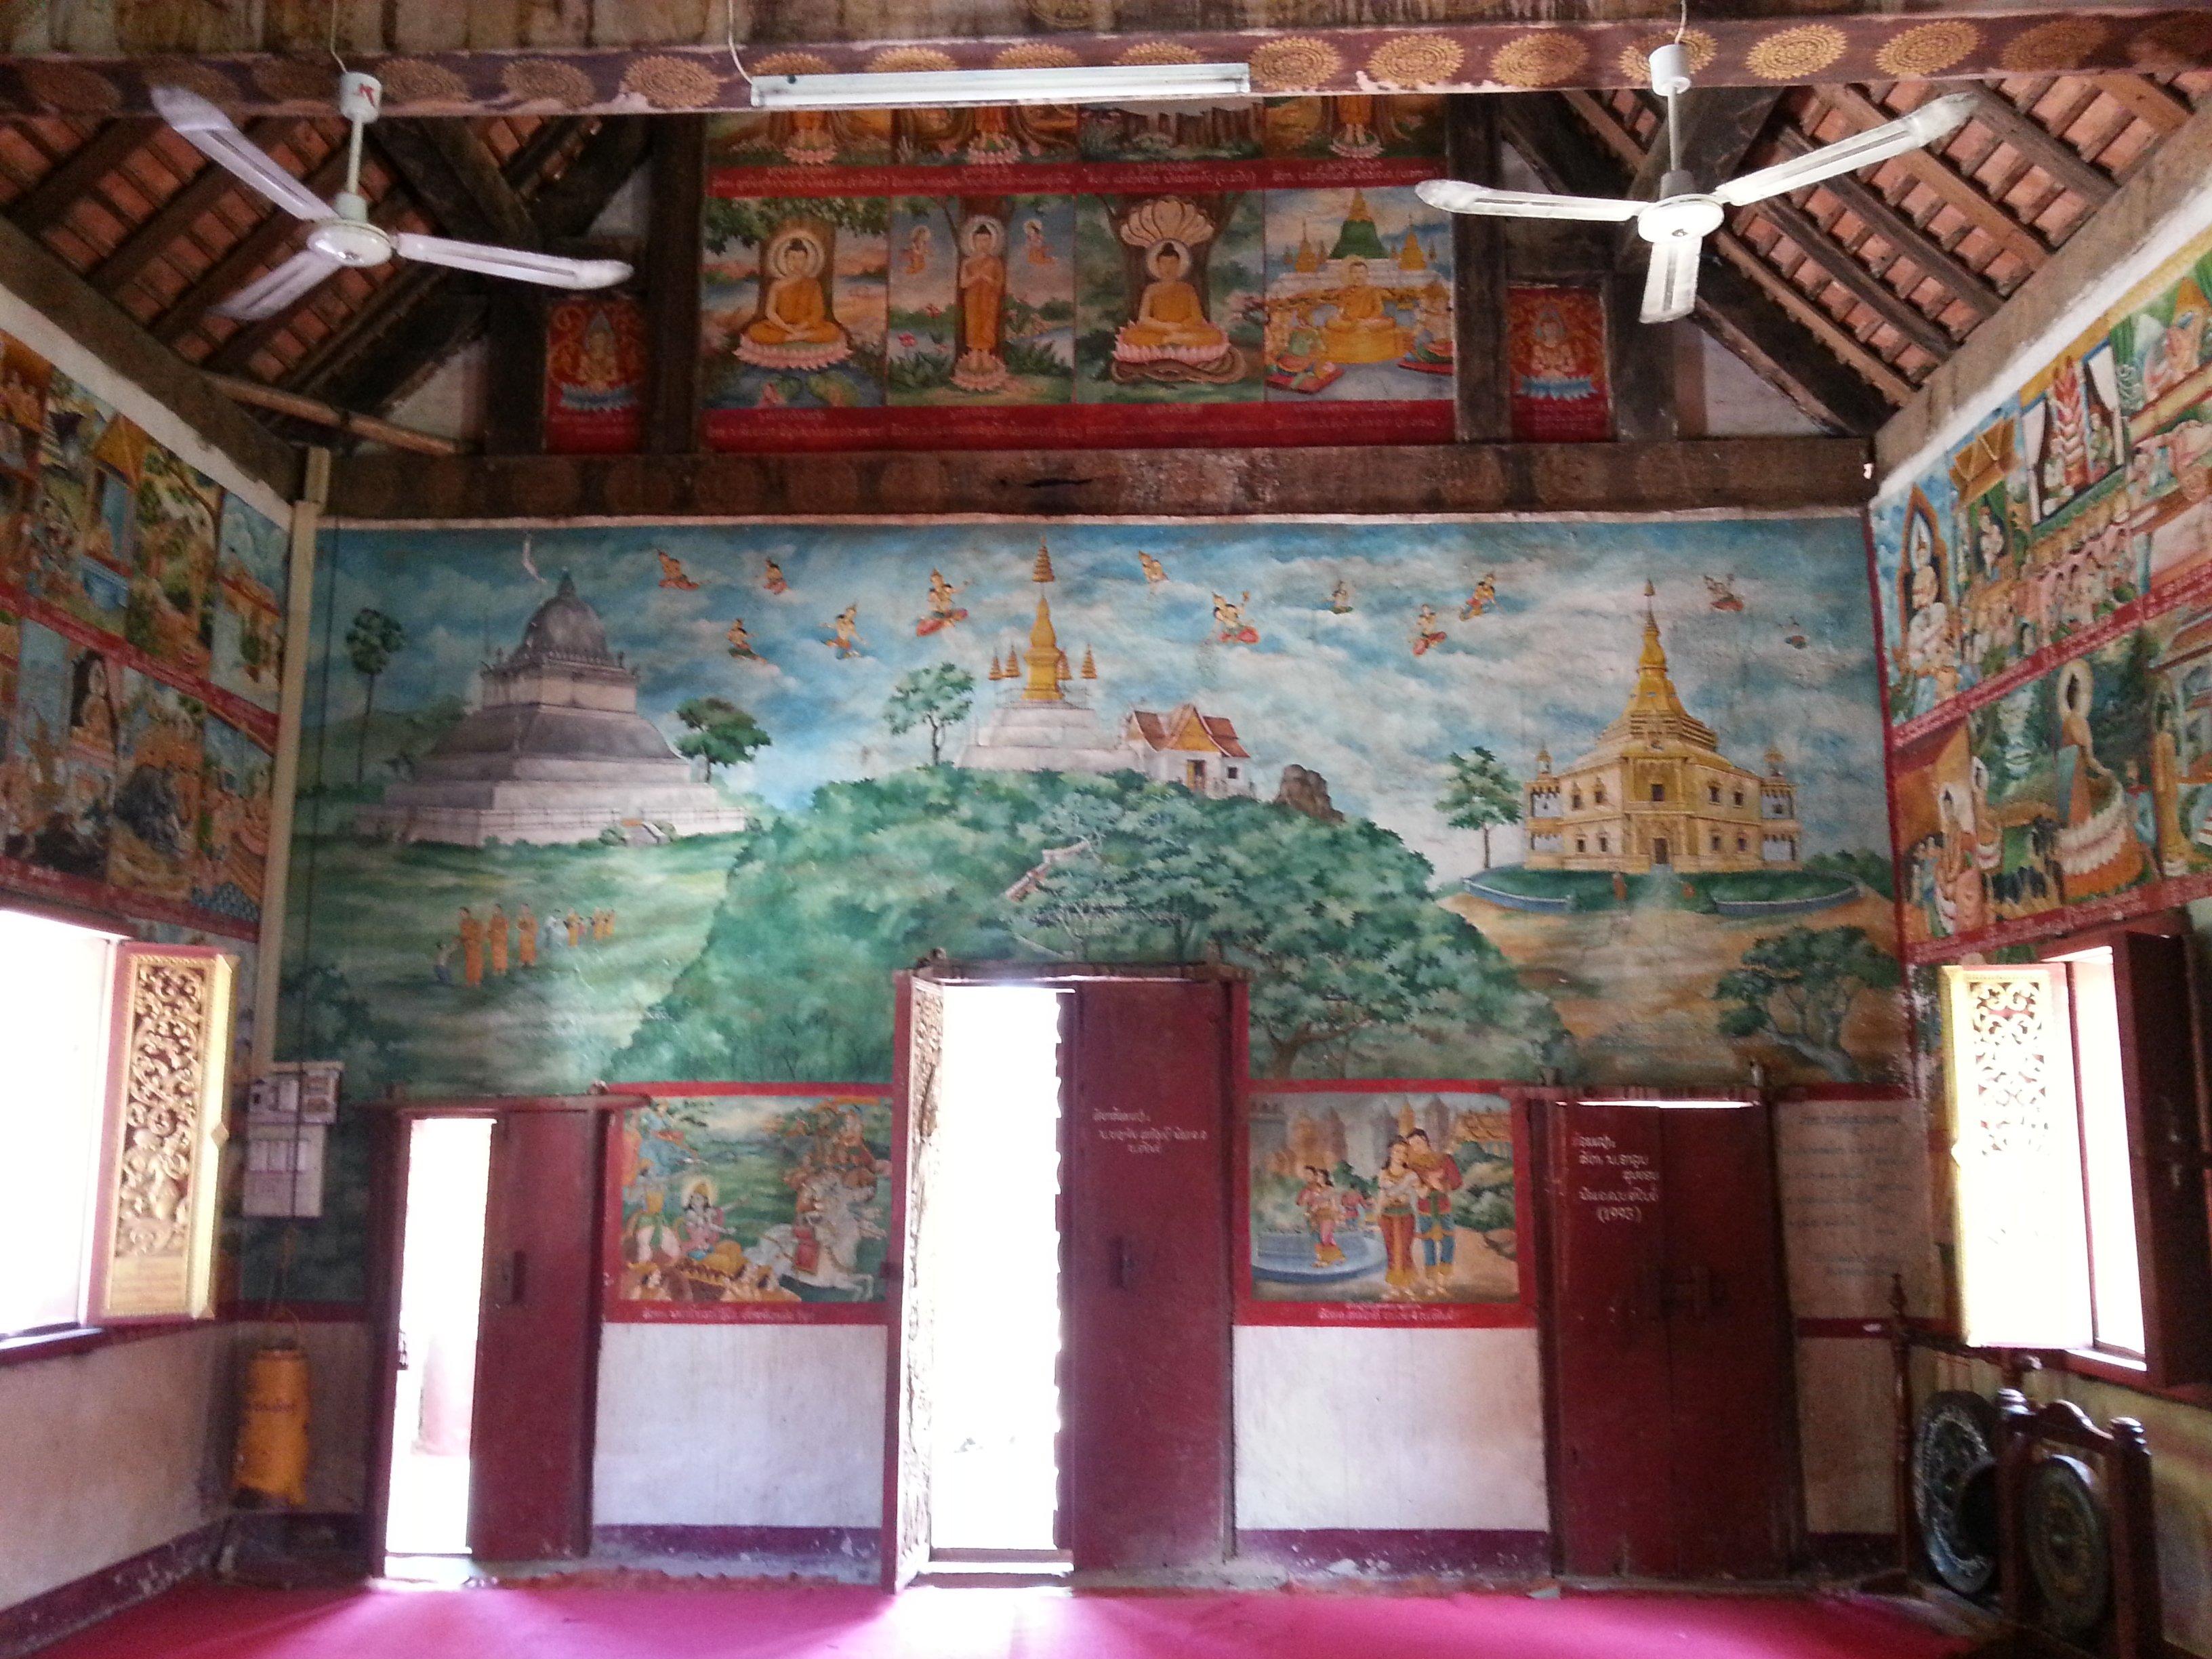 Murals telling the history of Luang Prabang